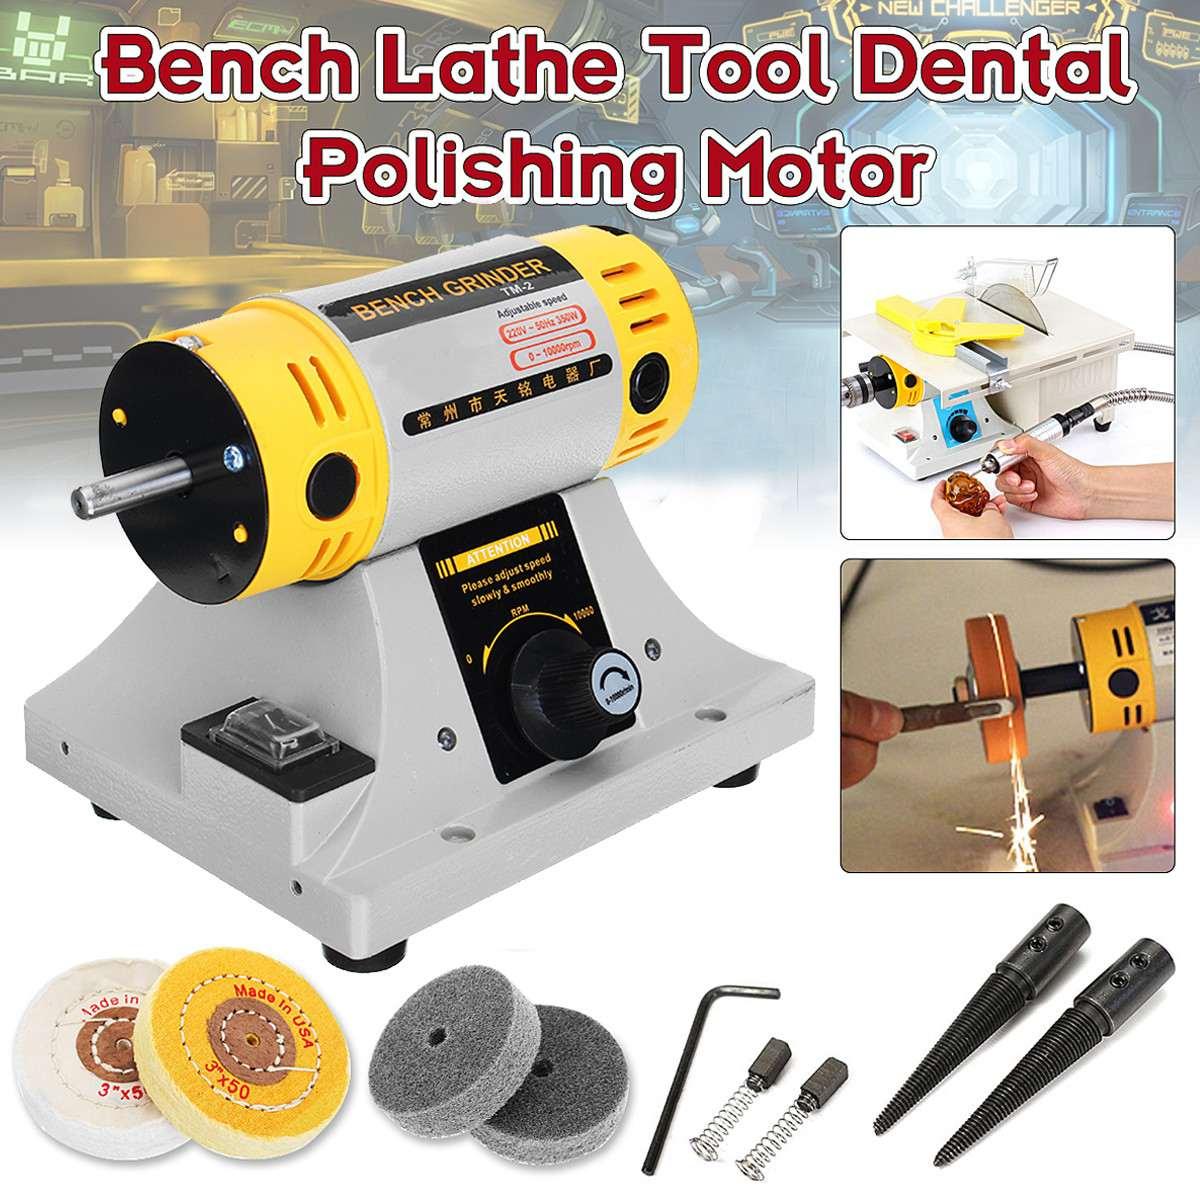 New 350W 220V Multi-purpose Mini Bench Grinder Polishing Machine Kit For Jewelry Dental Motor Lathe Bench Grinder Kit Set